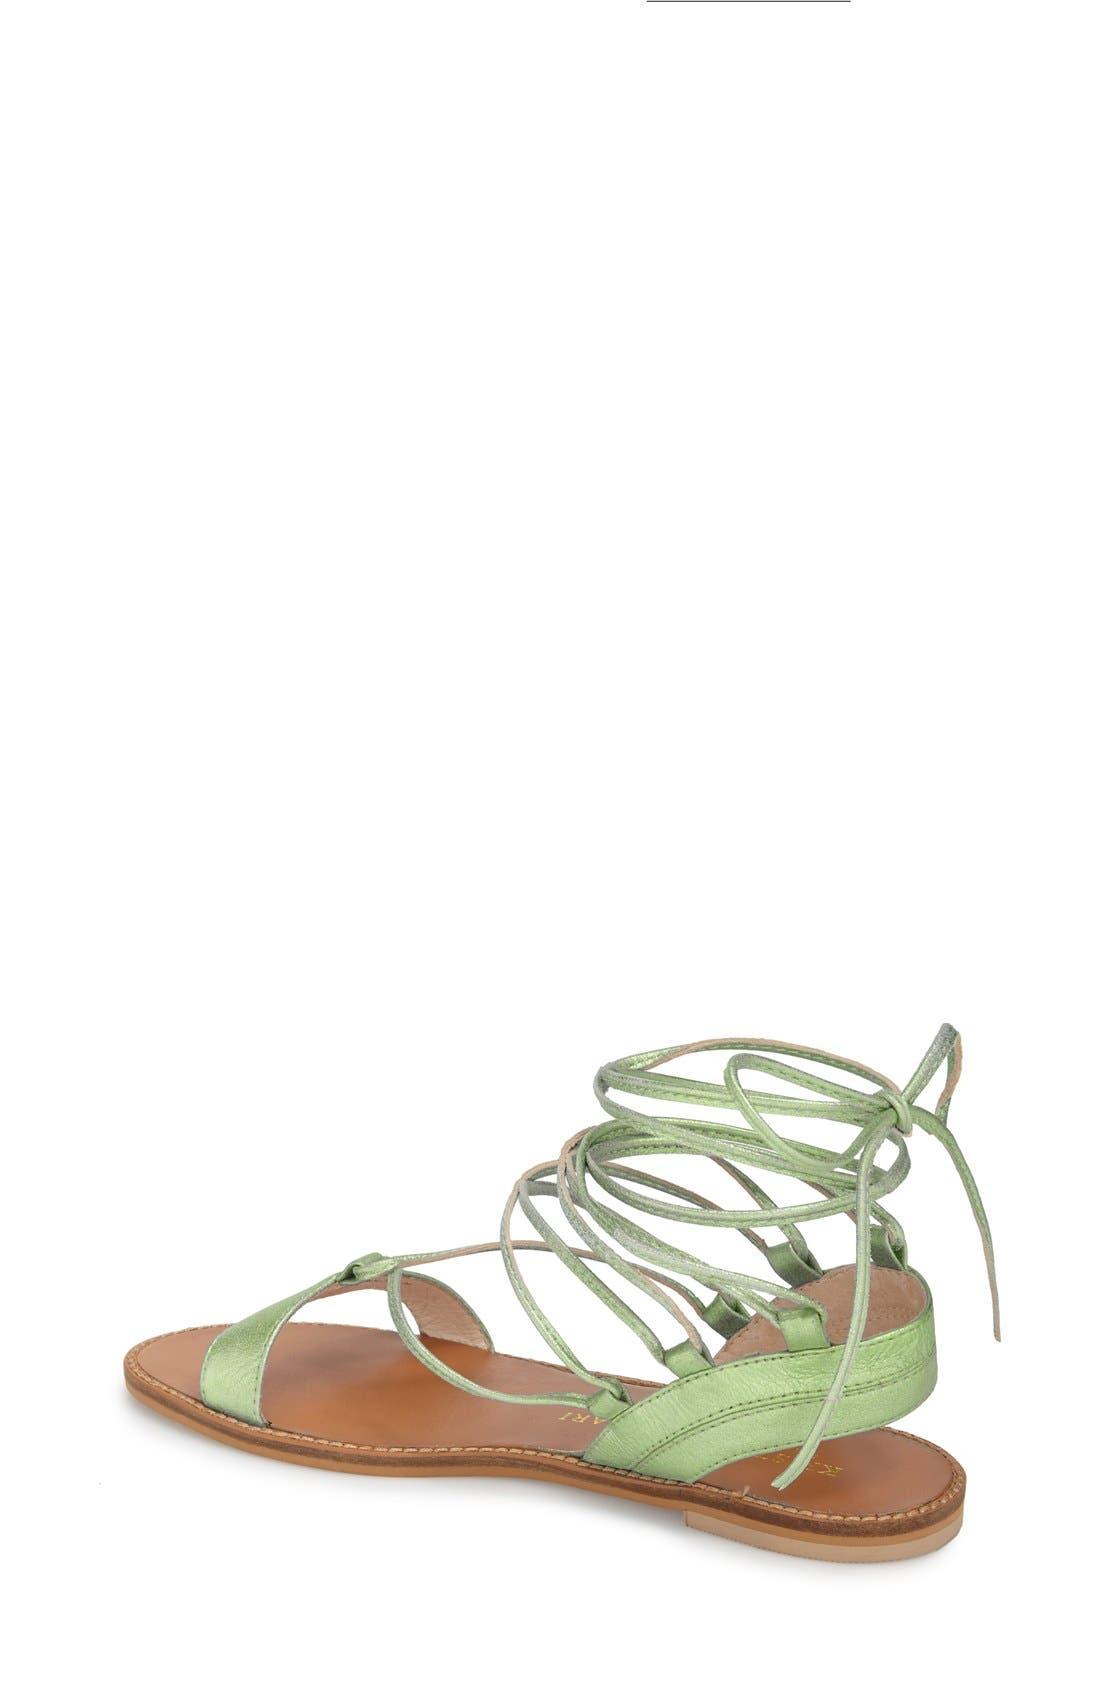 Alternate Image 2  - Kristin Cavallari 'Belle' Lace-Up Sandal (Women)